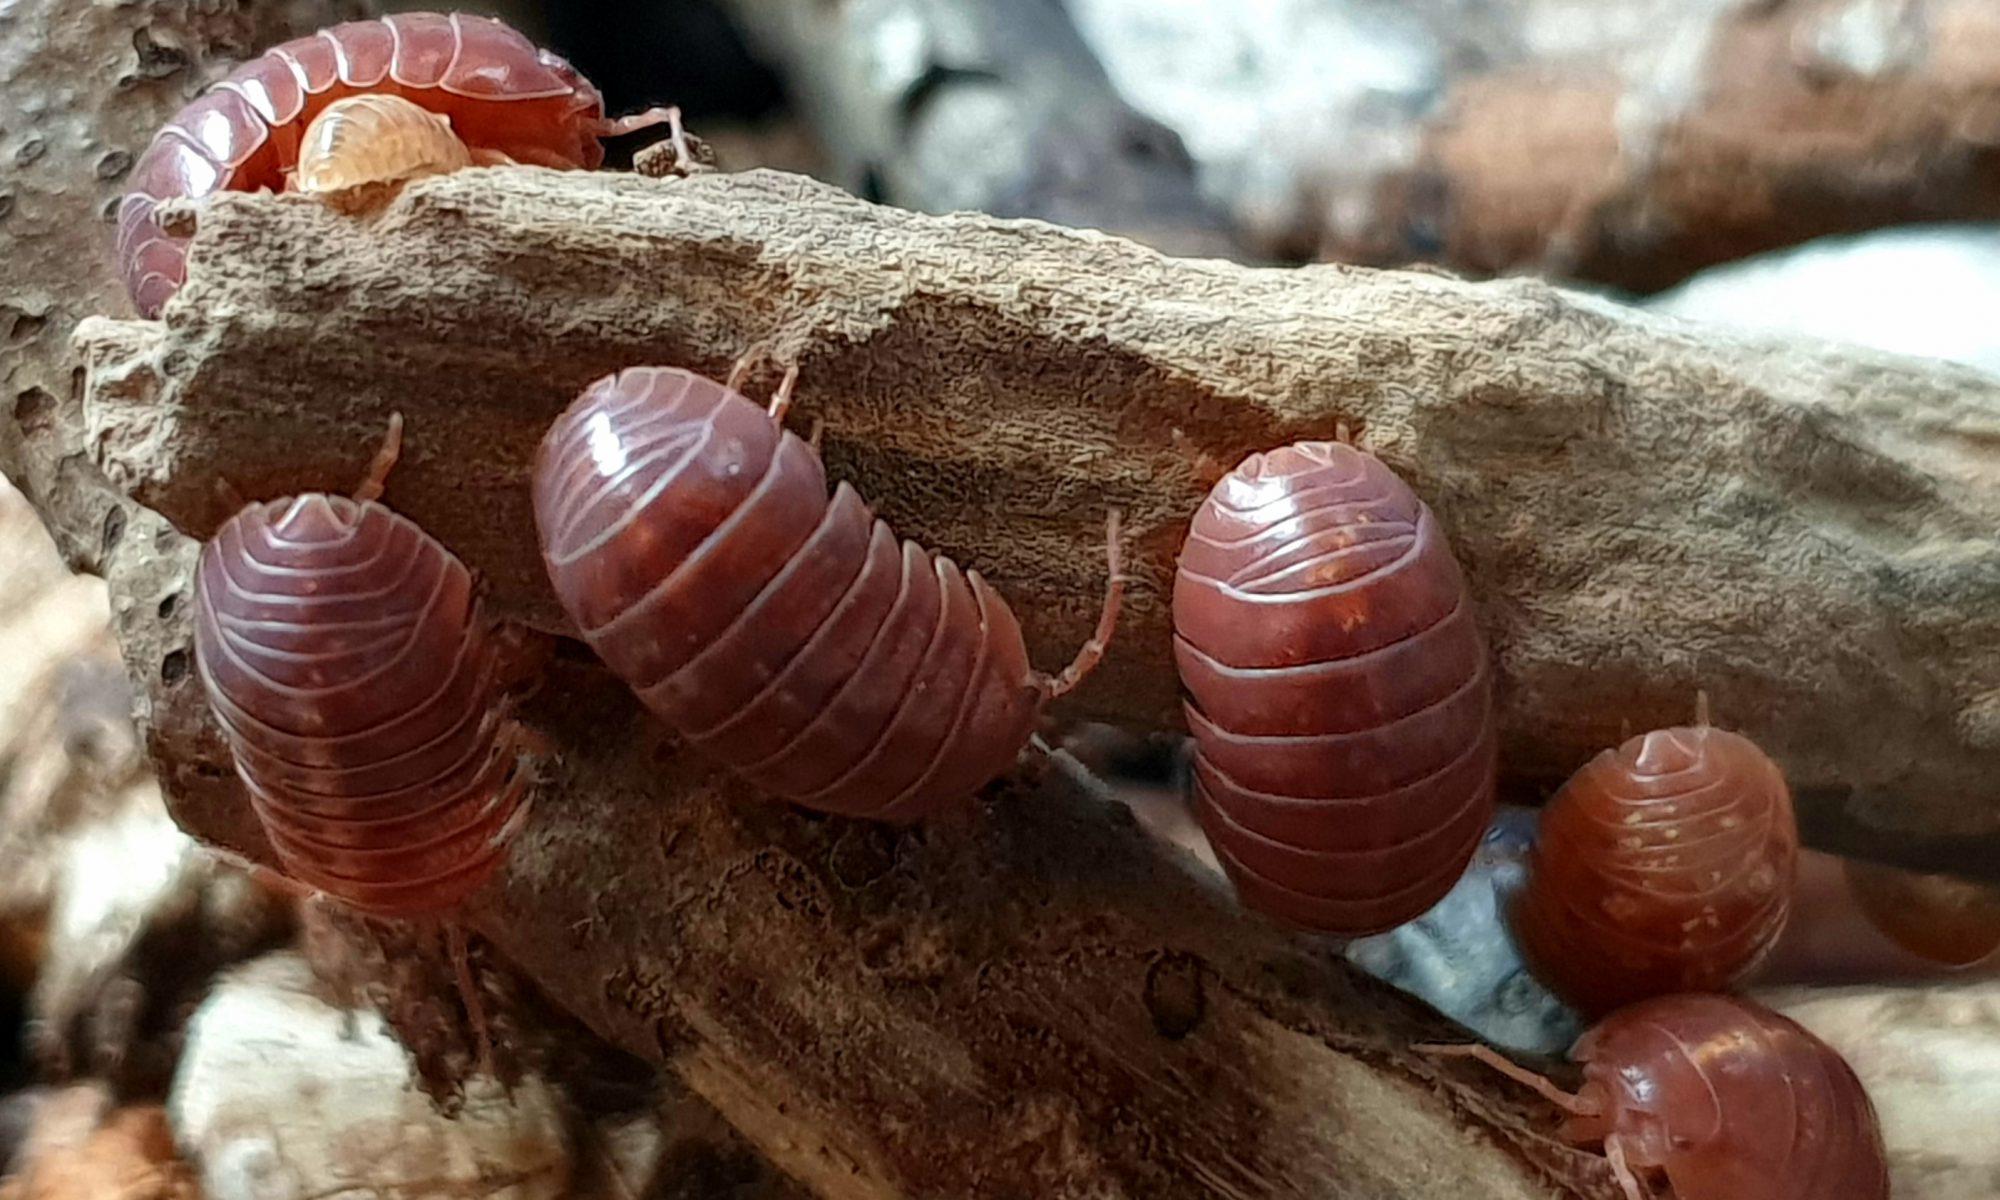 pissebed van de soort Armadillidium vulgare red